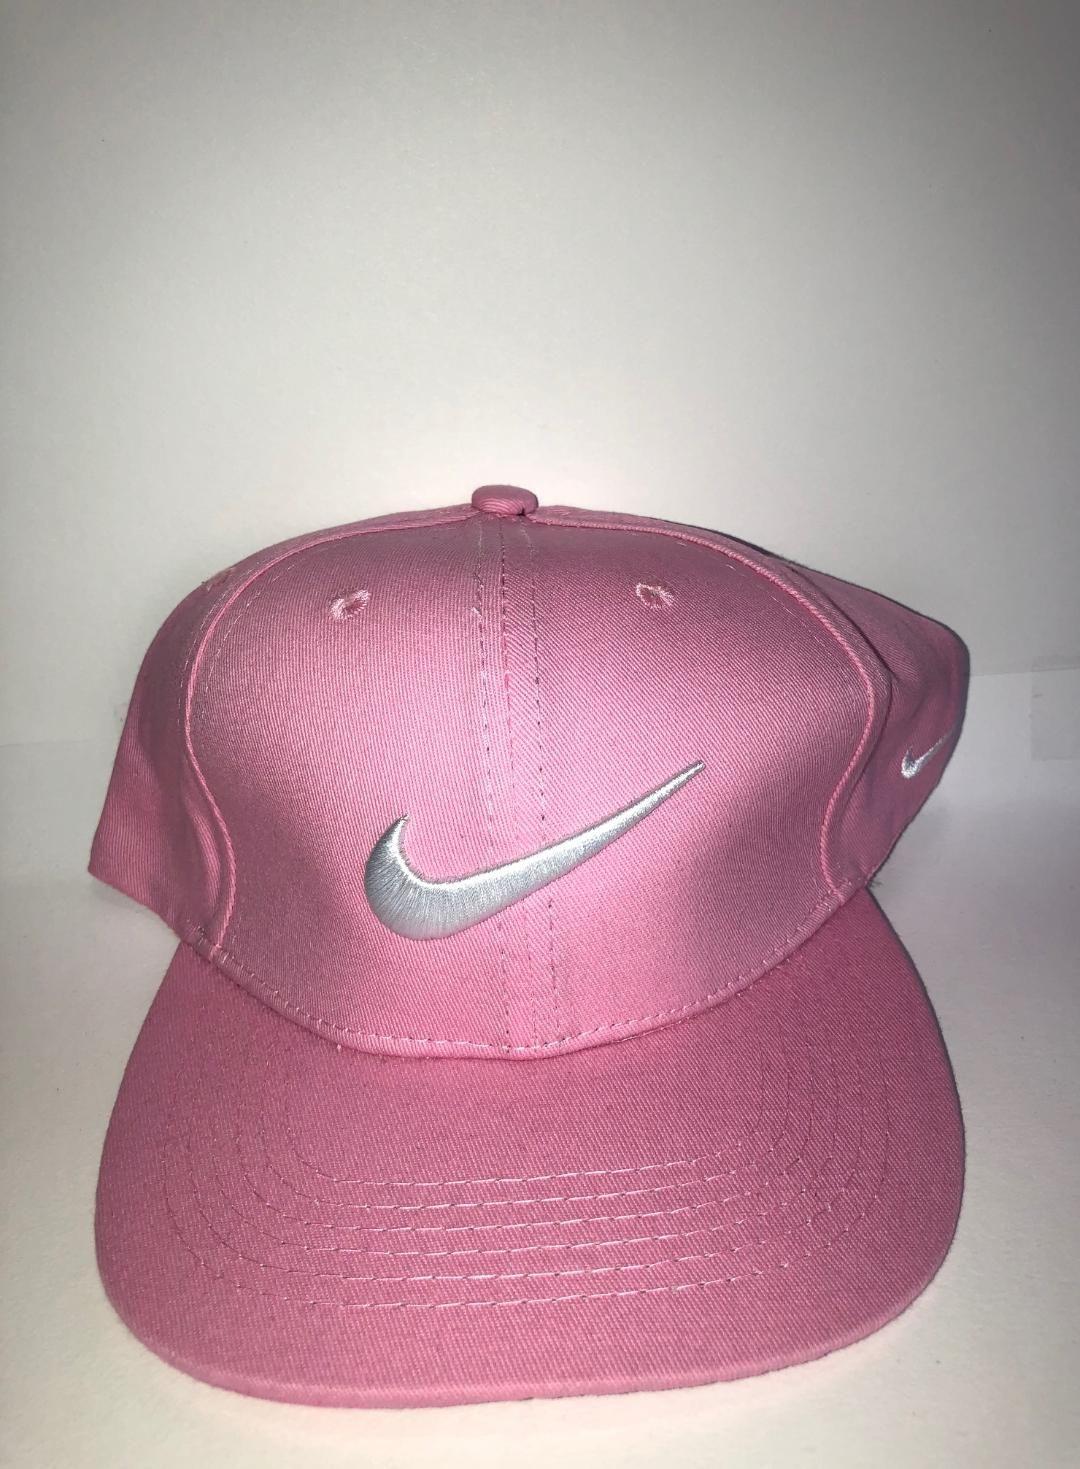 half off 4a541 a504d vintage nike cap - Google Search   Mood   Vintage nike, Cap, Hats